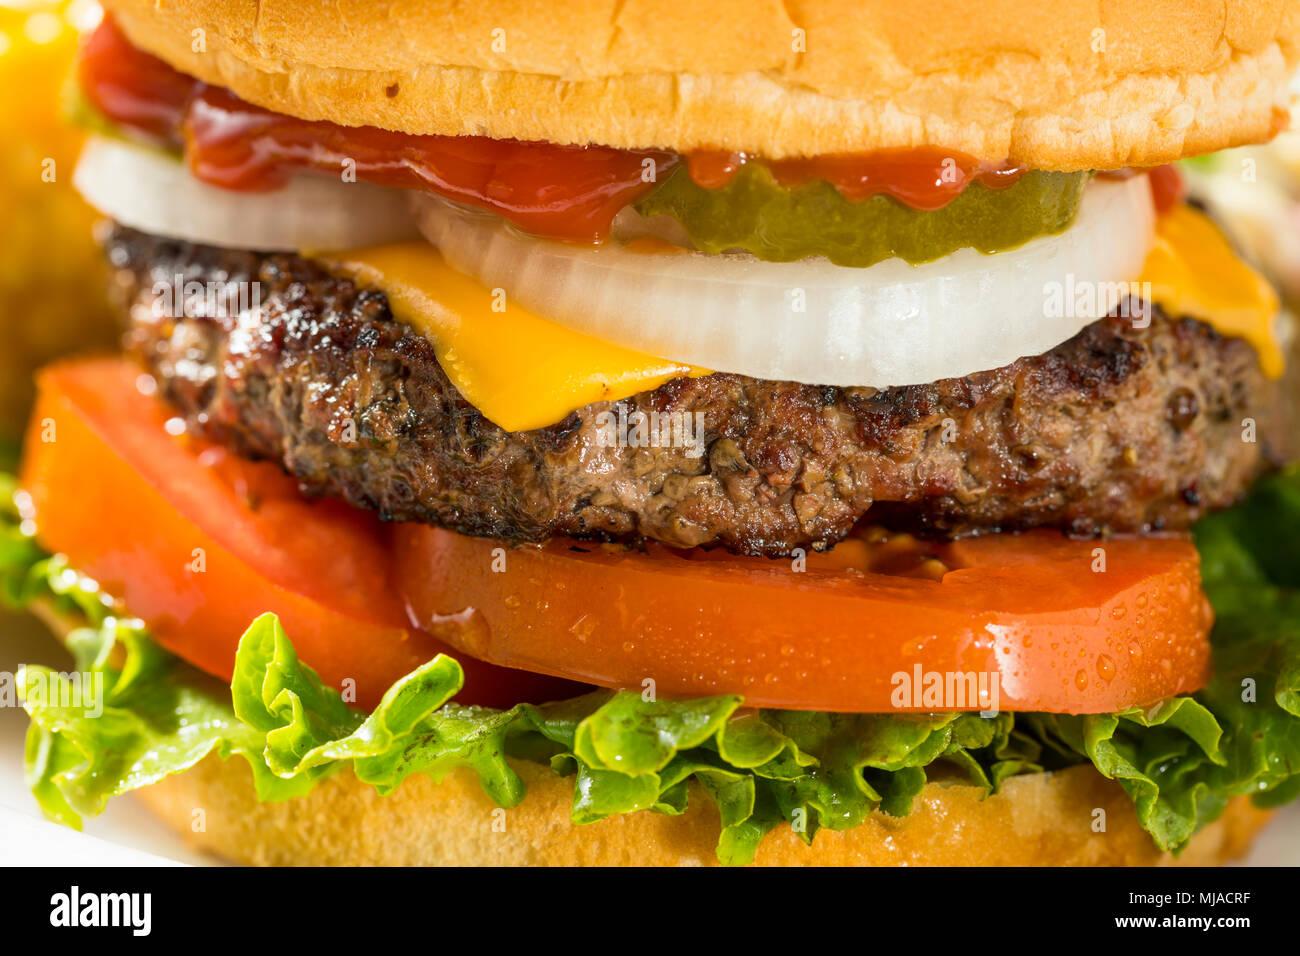 Memorial Day Backyard Babecue avec repas Hamburgers Hot dog Salades et frites Banque D'Images